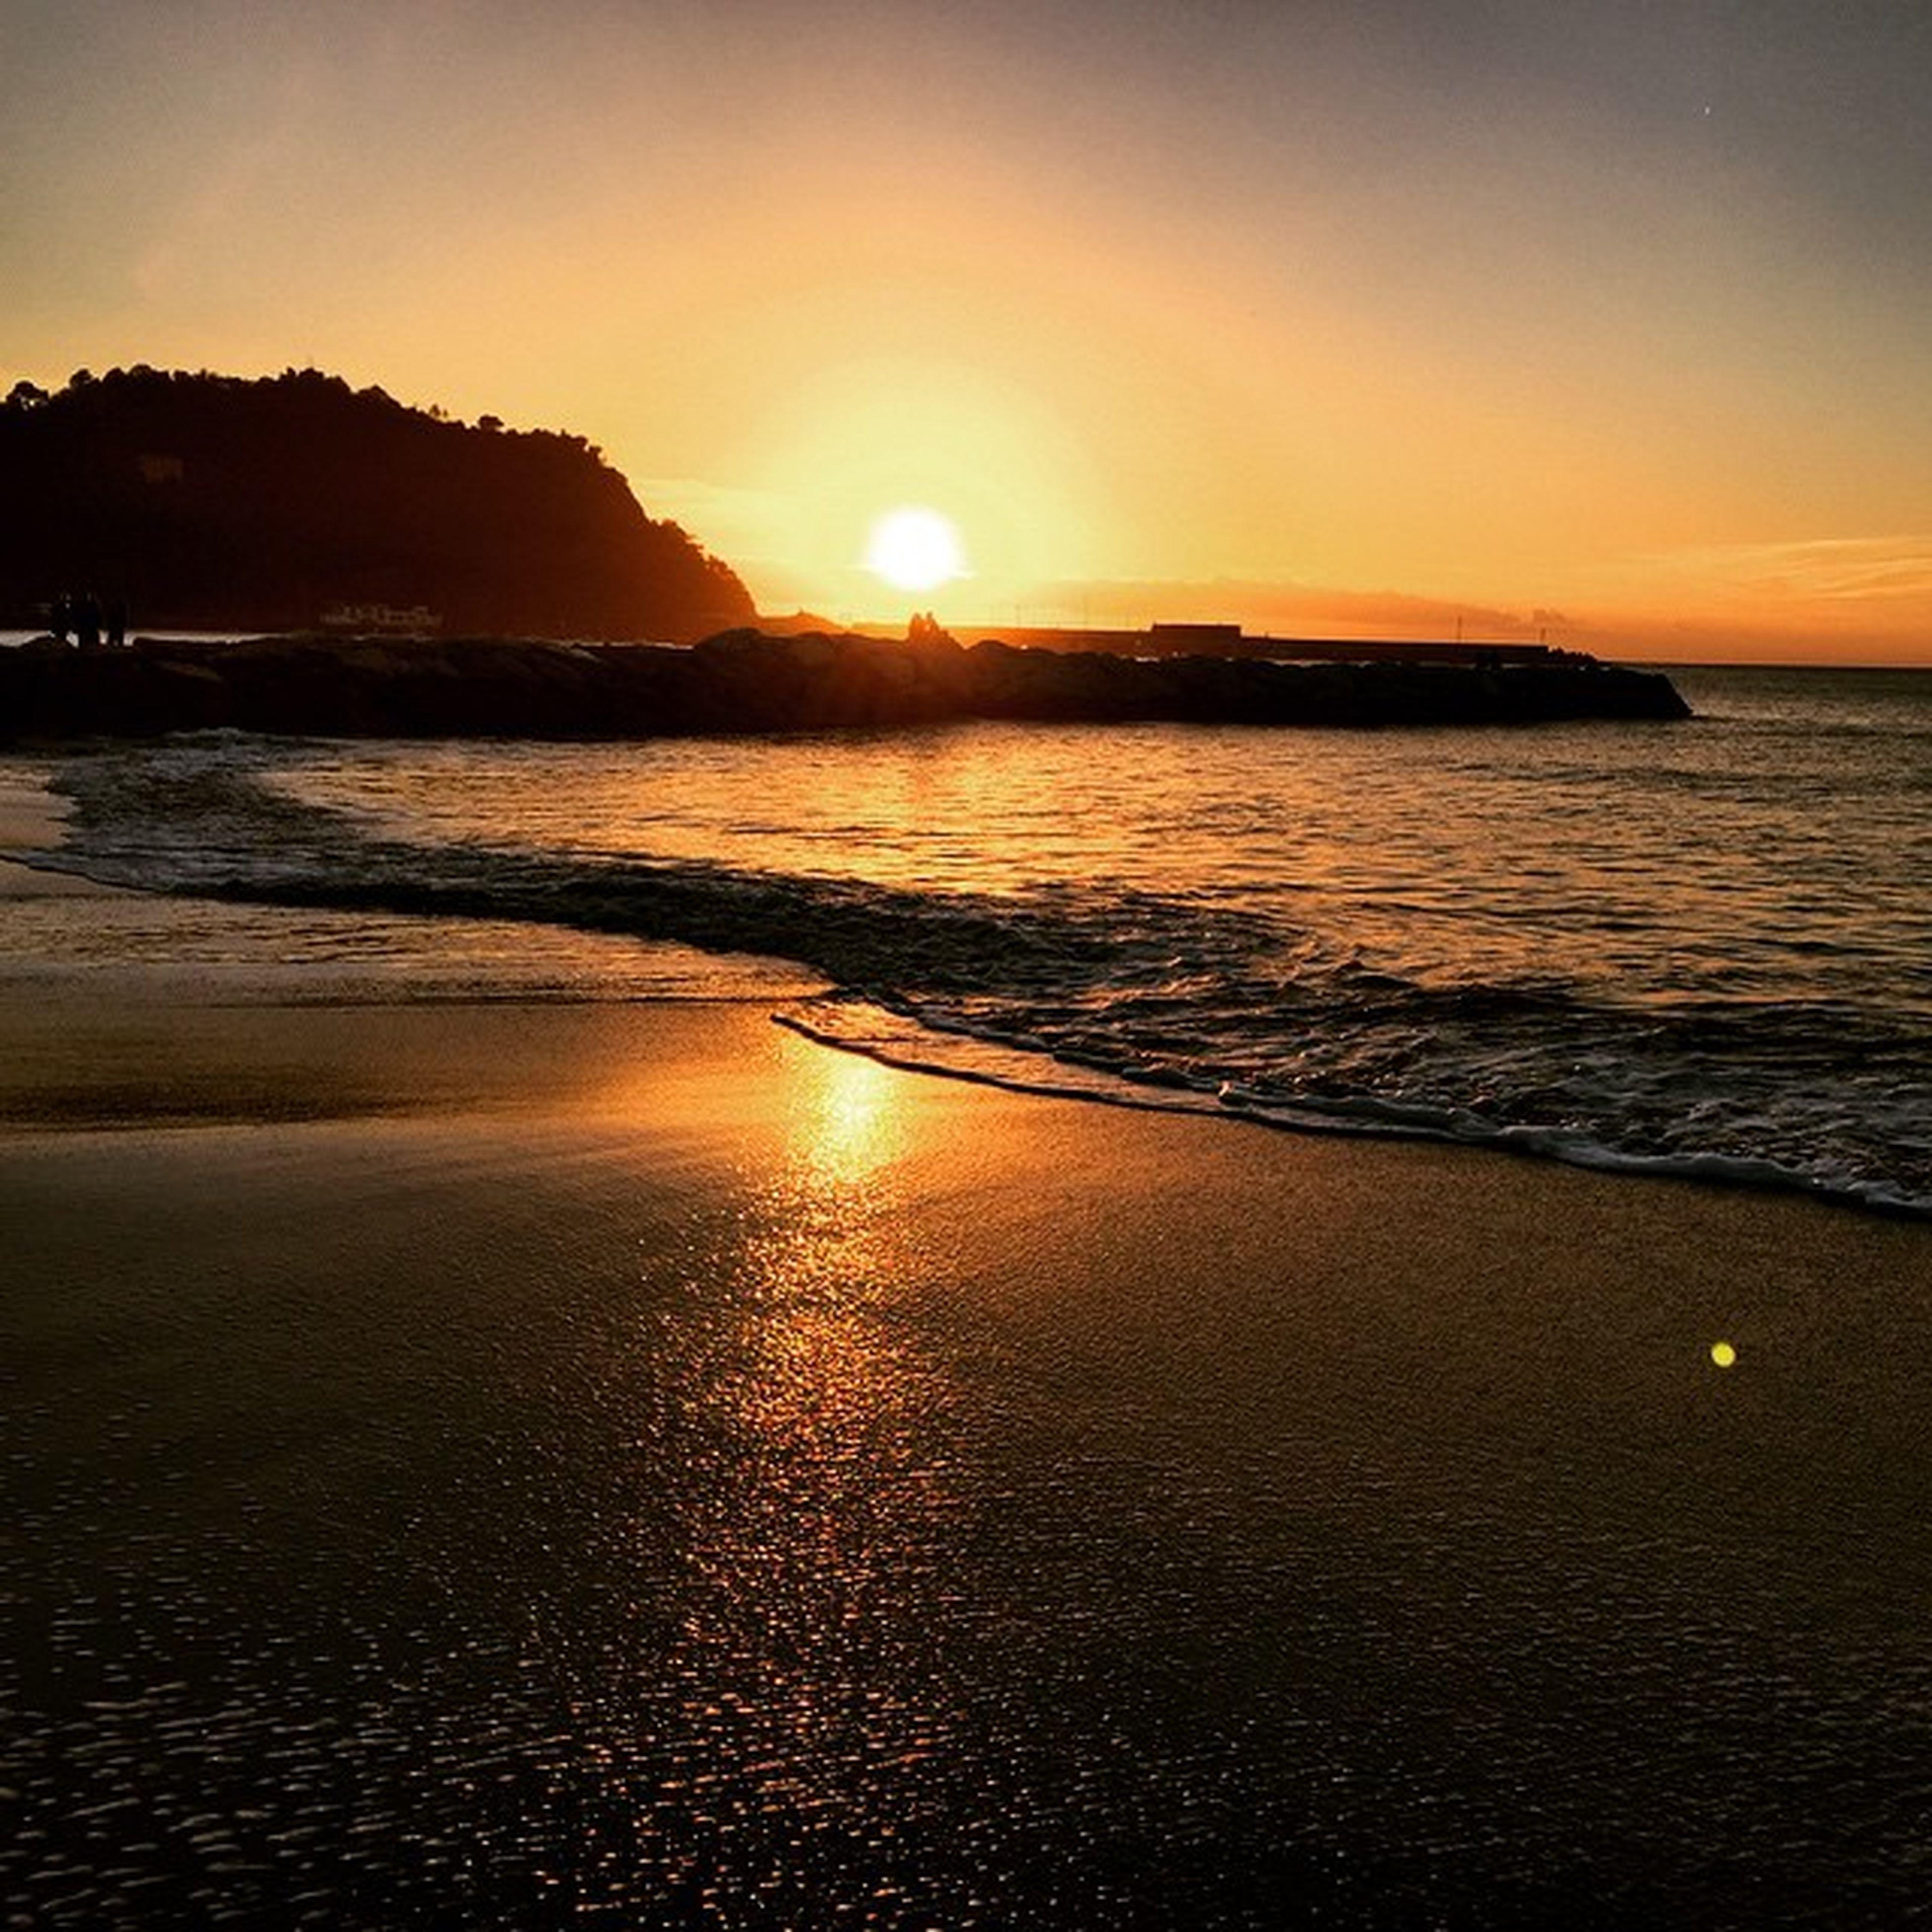 sunset, sea, water, sun, beach, scenics, tranquil scene, beauty in nature, orange color, horizon over water, tranquility, reflection, shore, sky, idyllic, nature, wave, sunlight, silhouette, coastline